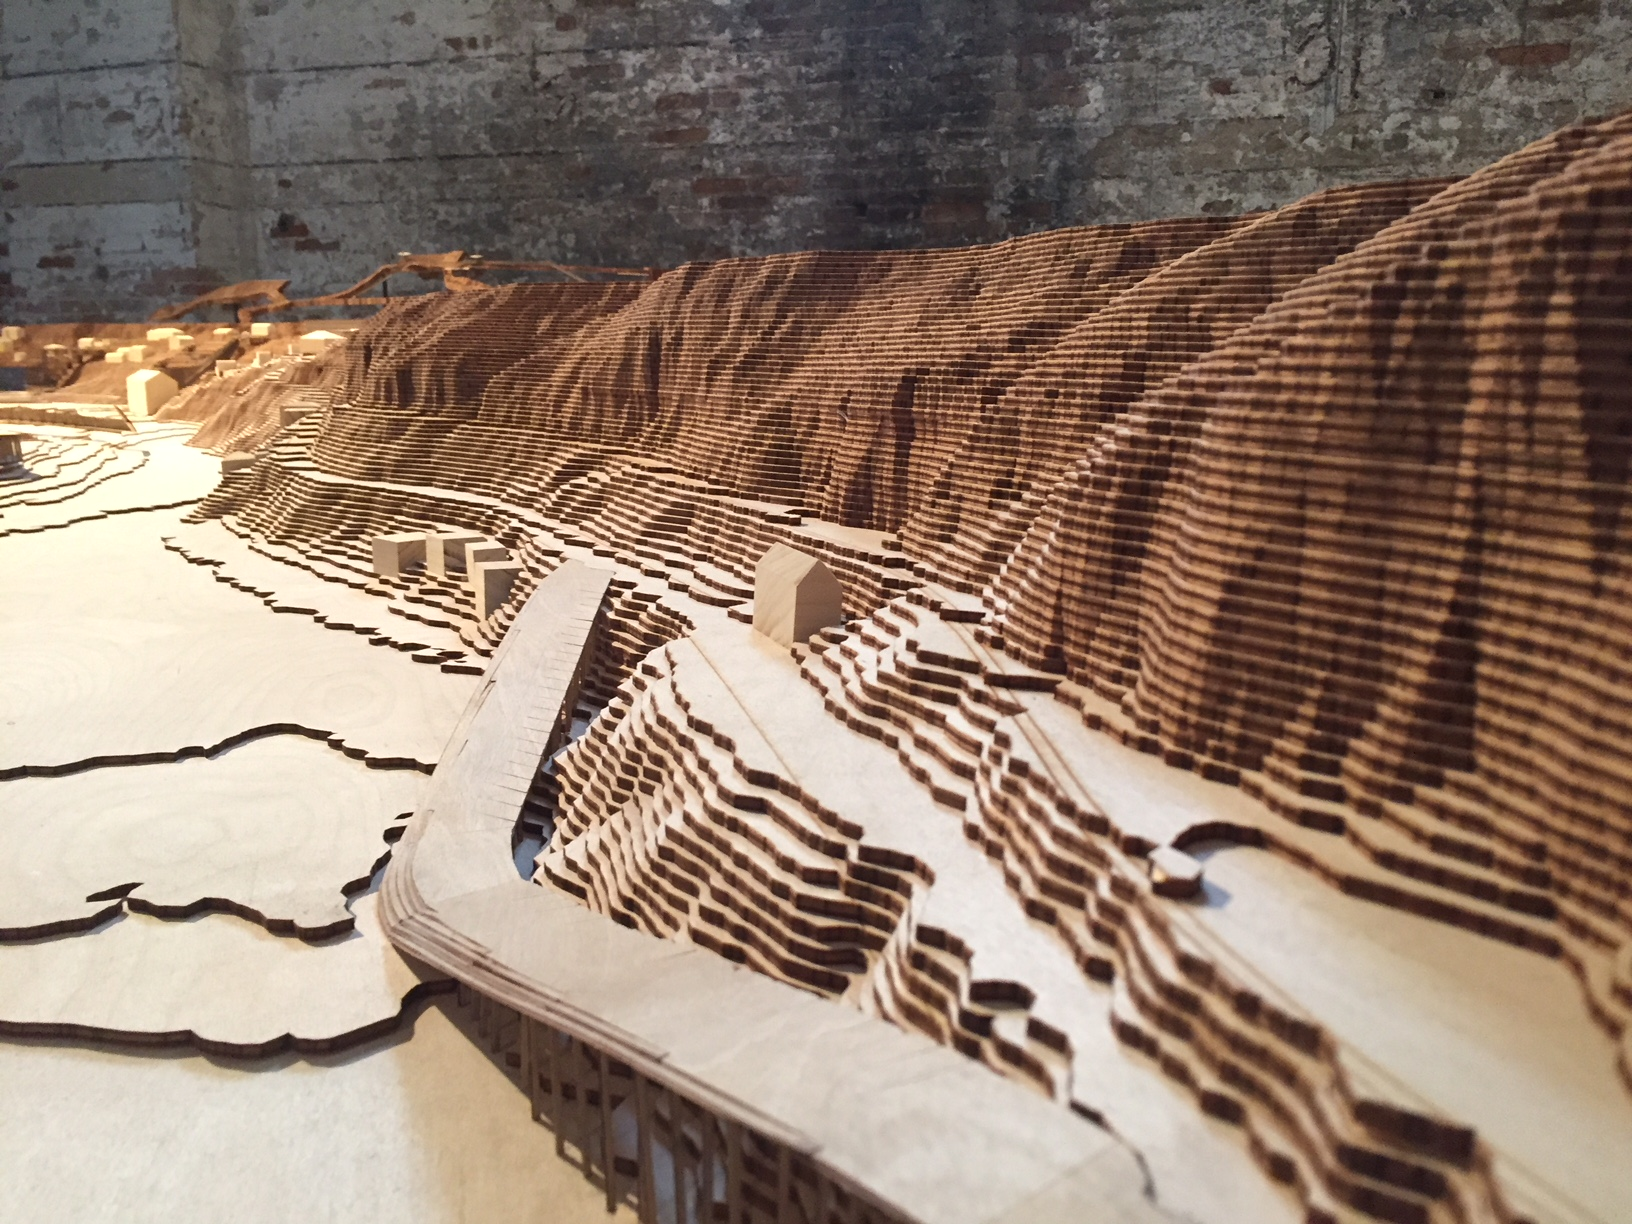 Obras Architectes, Biennale Architettura 2018, Arsenale